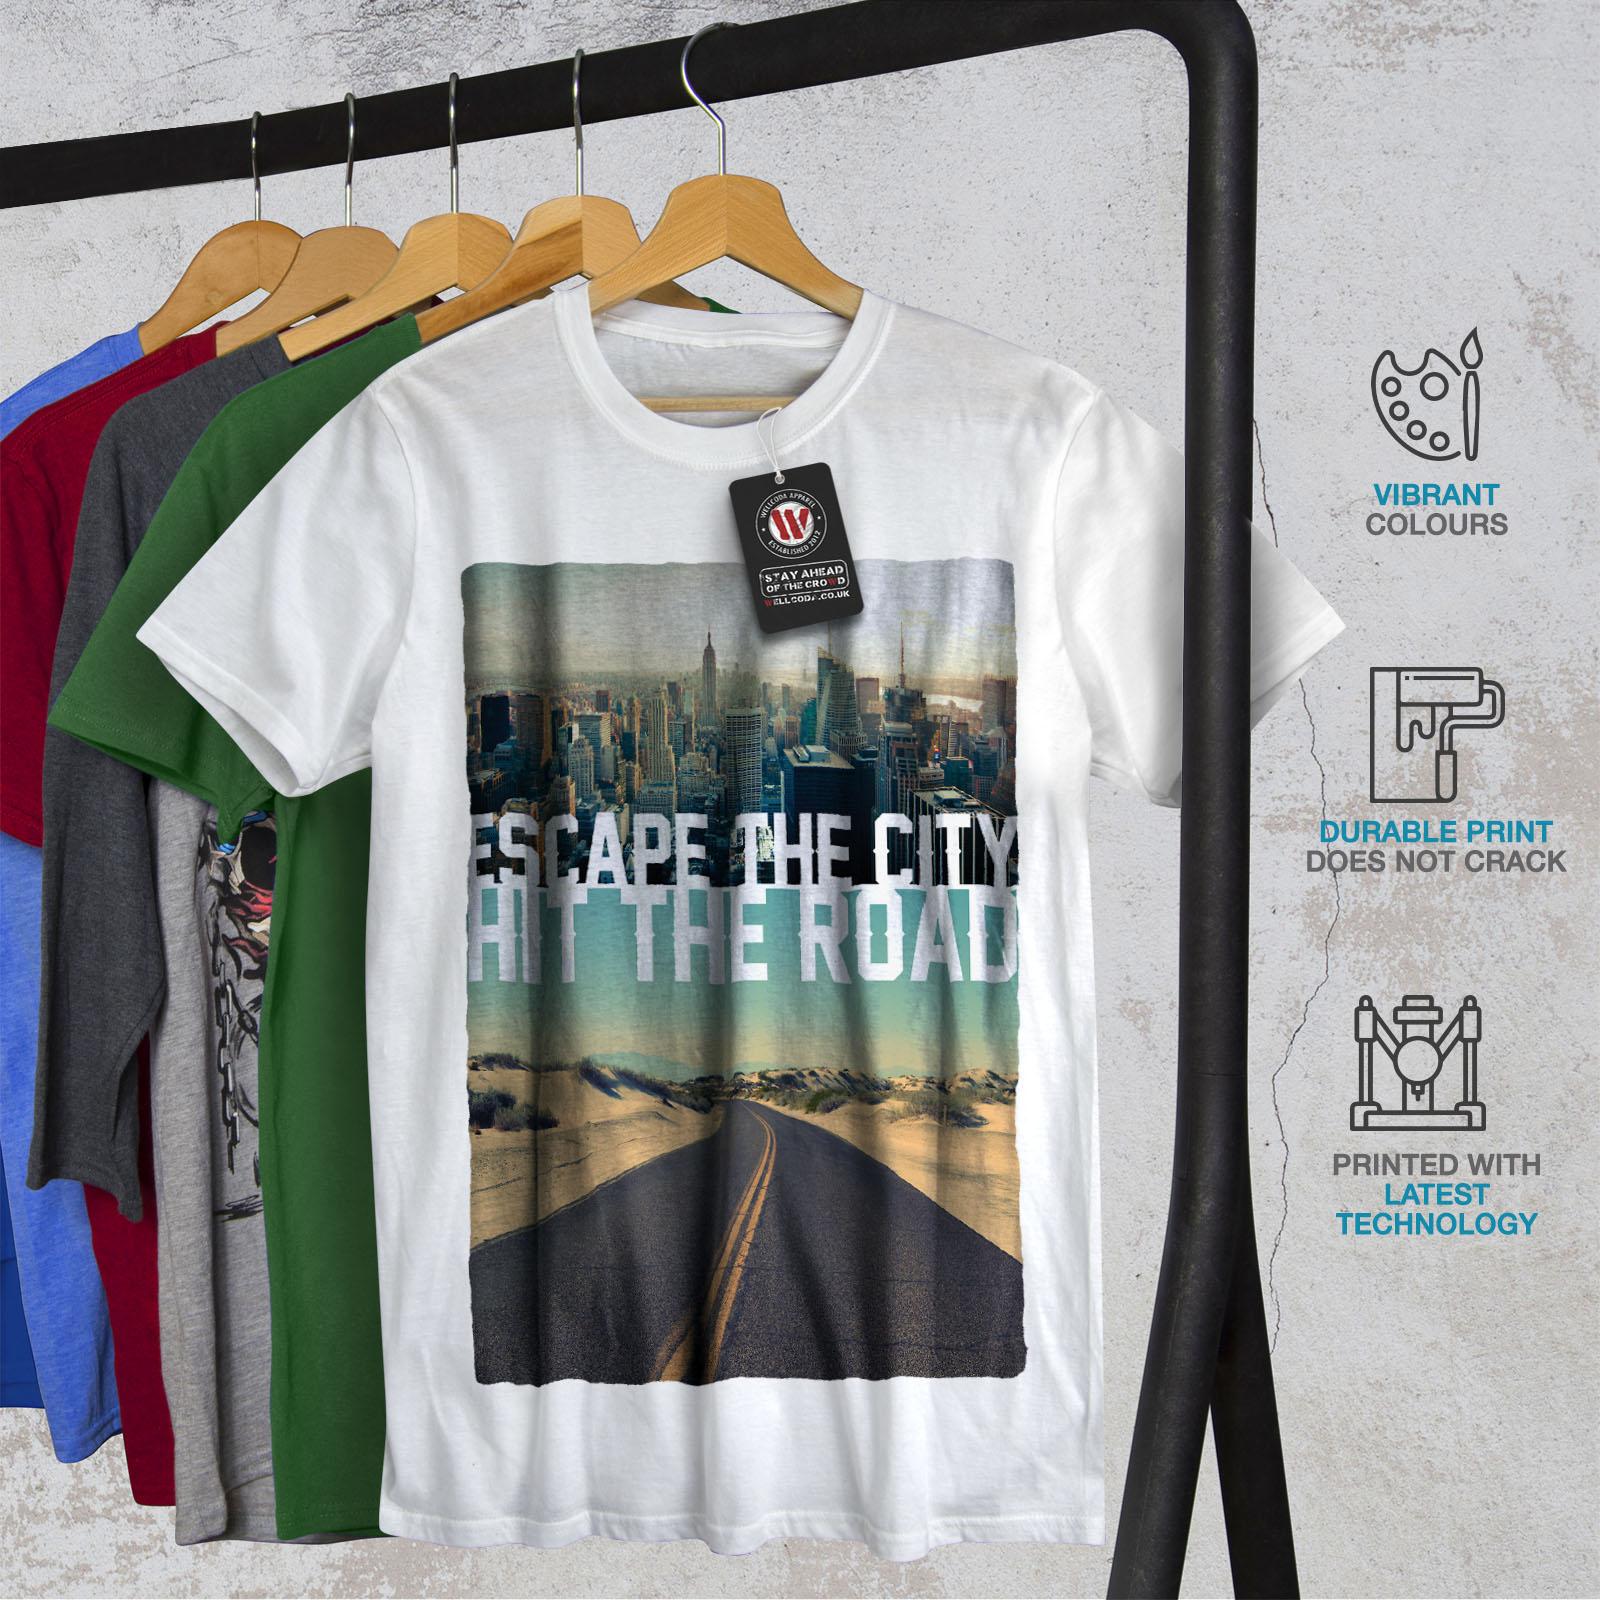 Wellcoda-Escape-The-City-Herren-T-Shirt-Lifestyle-Grafikdesign-Printed-Tee Indexbild 12